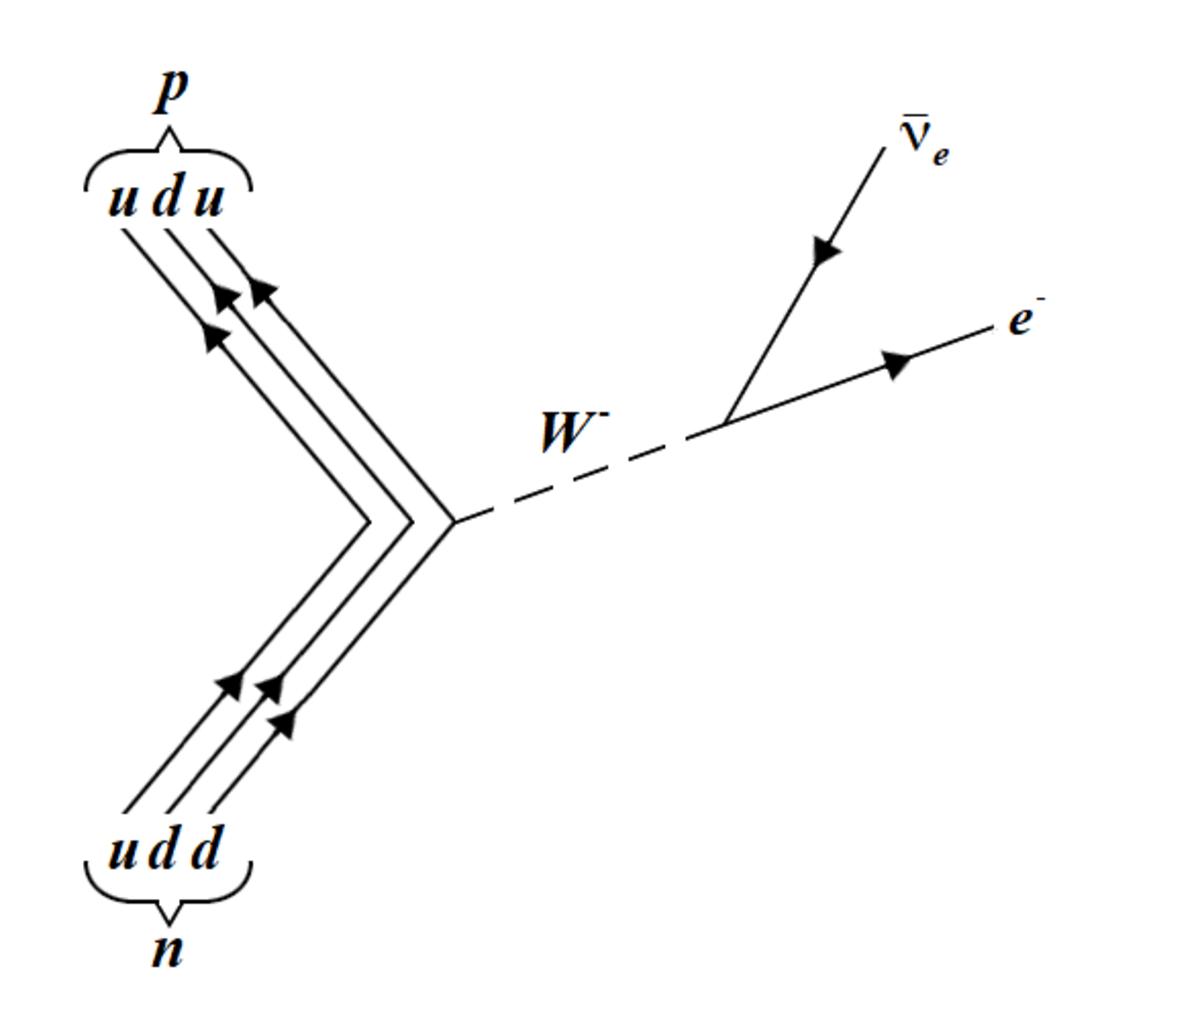 The beta decay of a neutron into a proton, through the weak interaction.